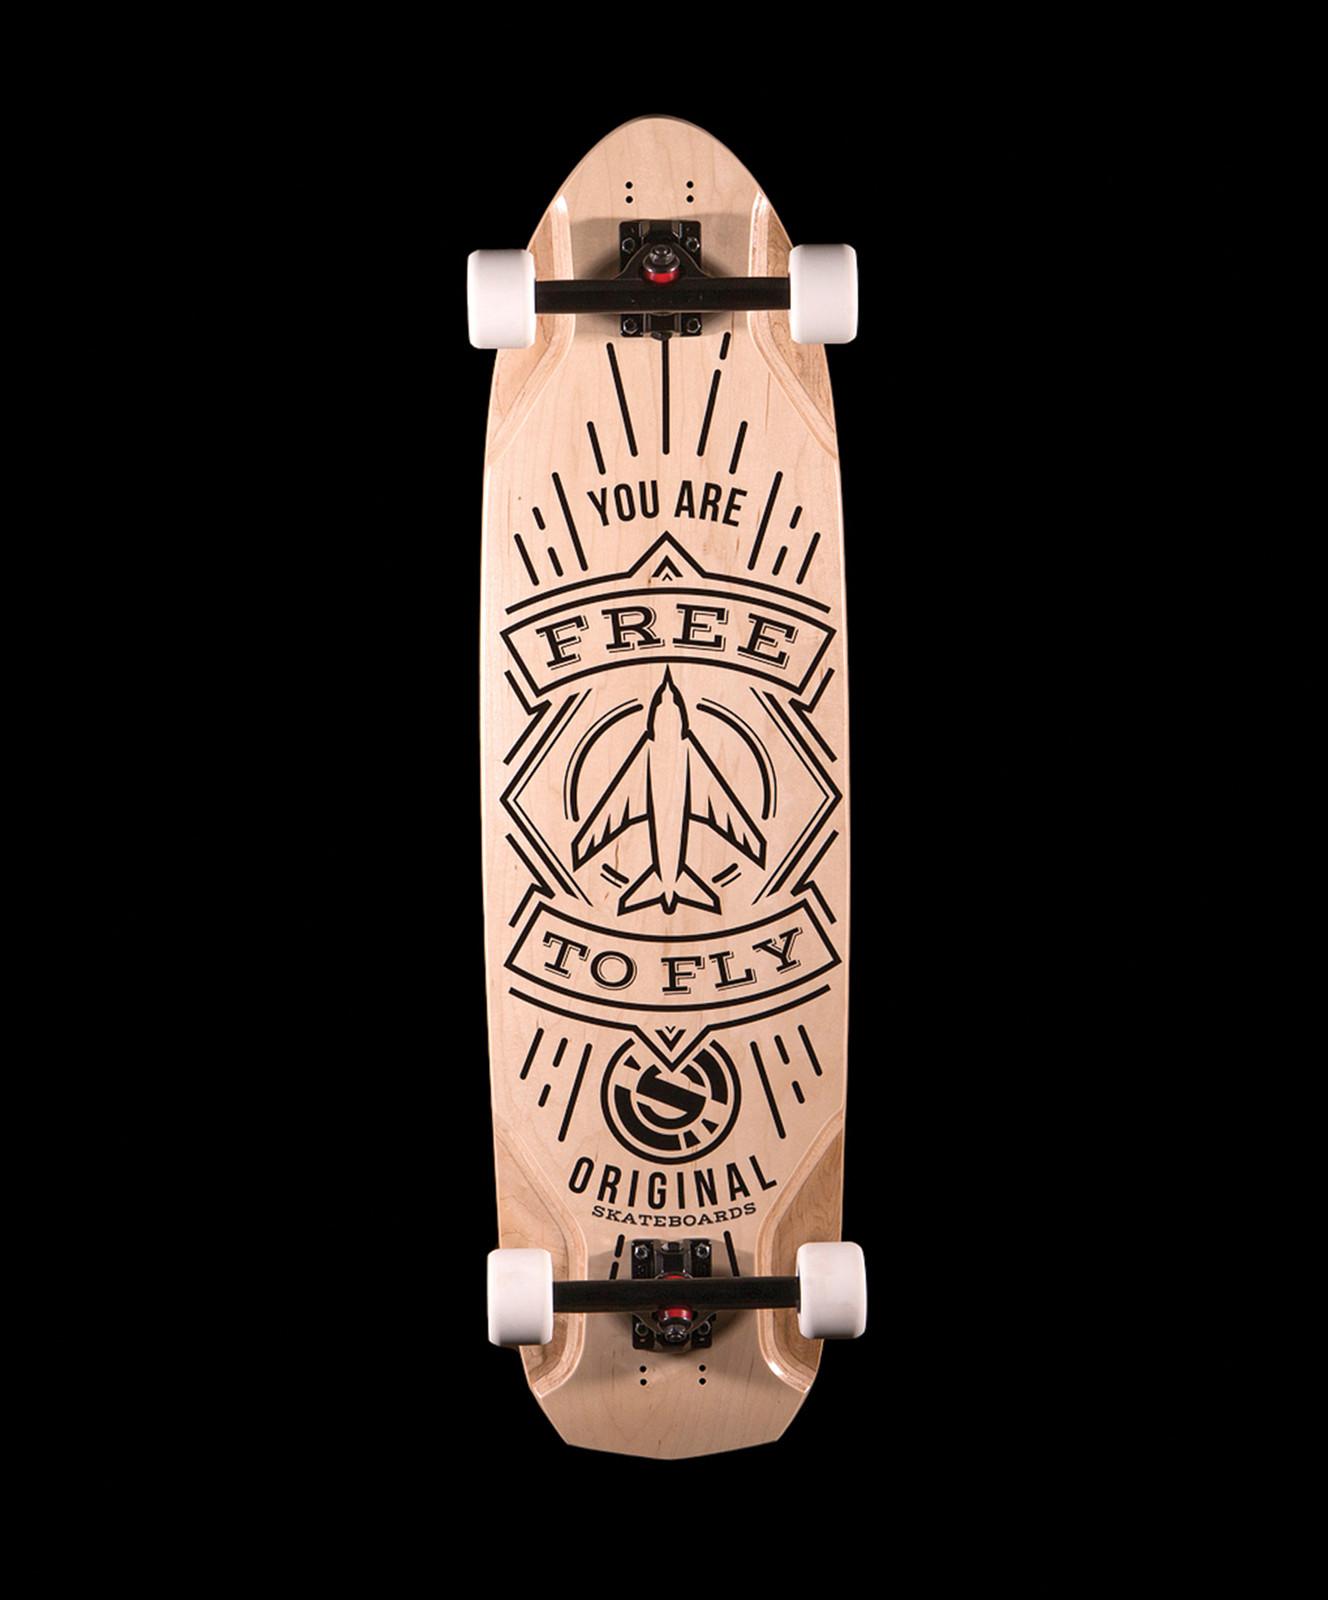 original beast longboard - HD1328×1600